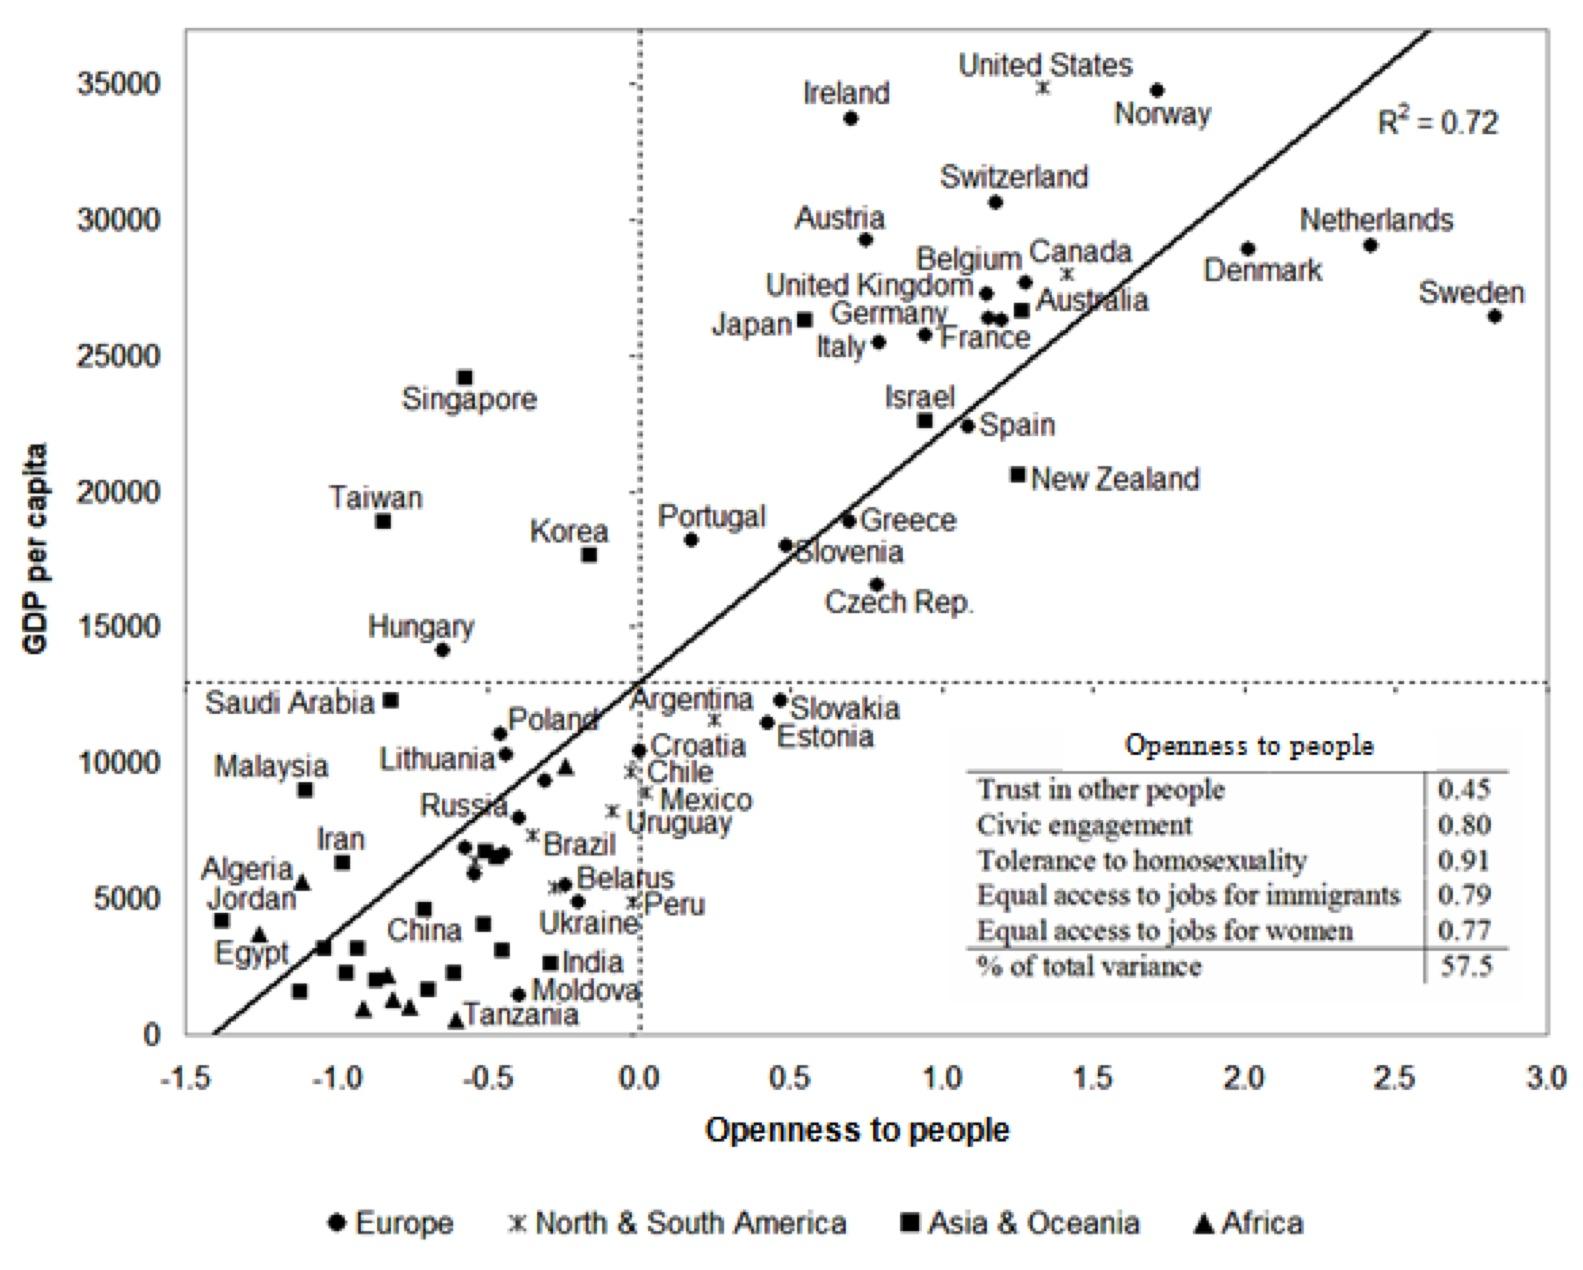 Source:  Fagerberg 2010